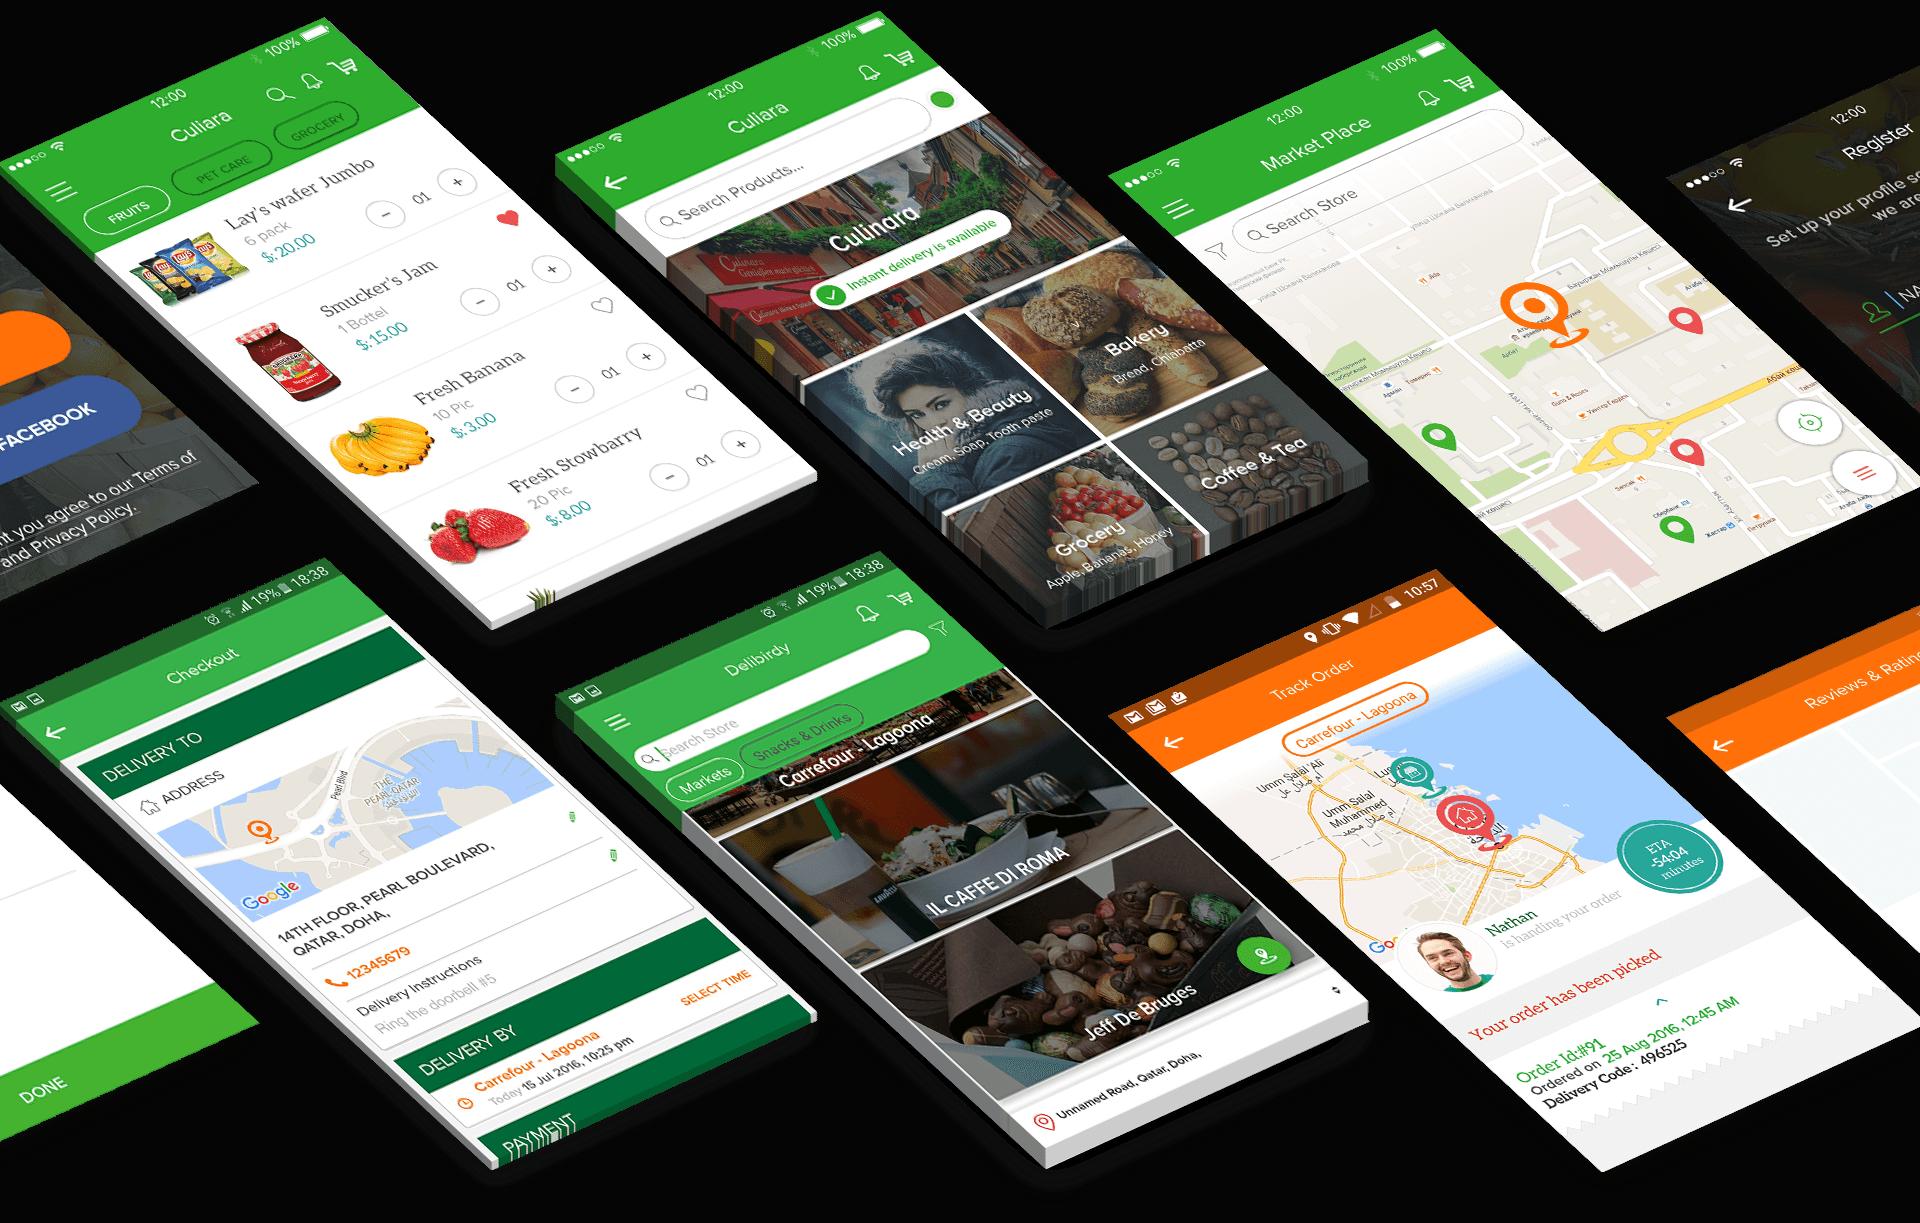 Vnsmat-Thiết kế App